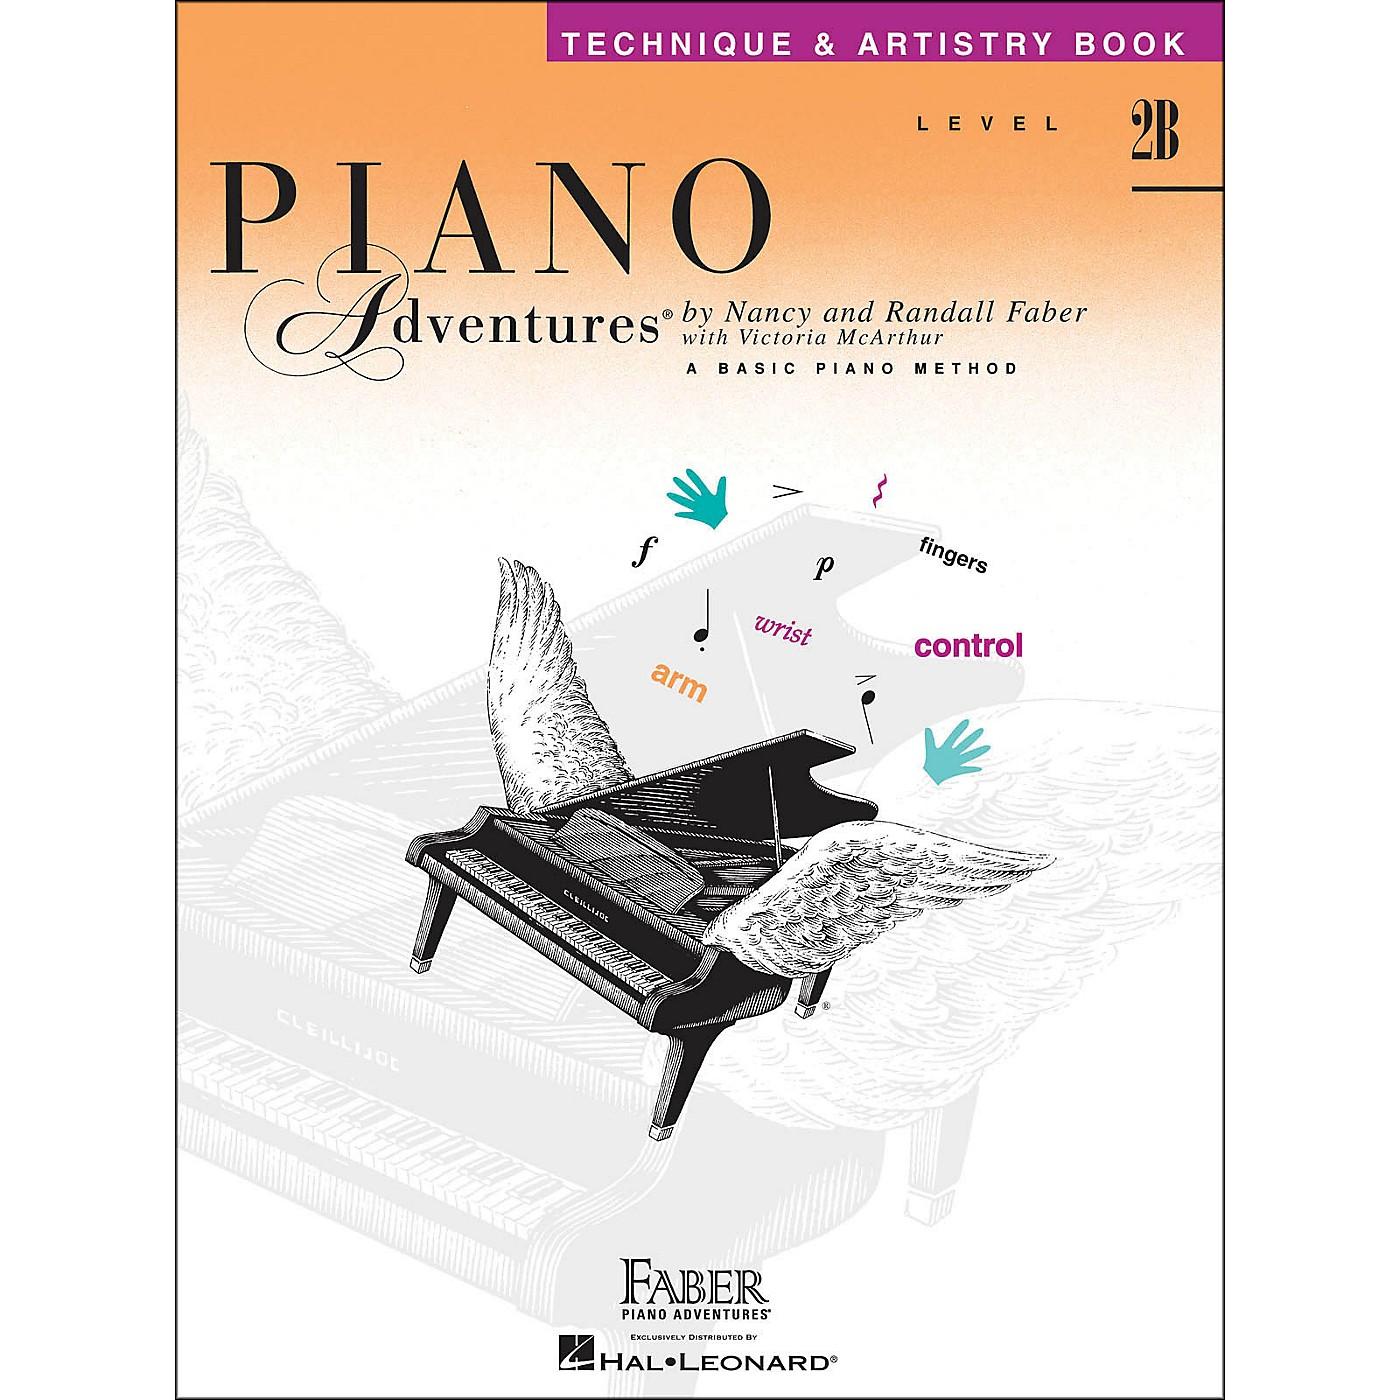 Faber Piano Adventures Piano Adventures Technique & Artistry Book Level 2B thumbnail